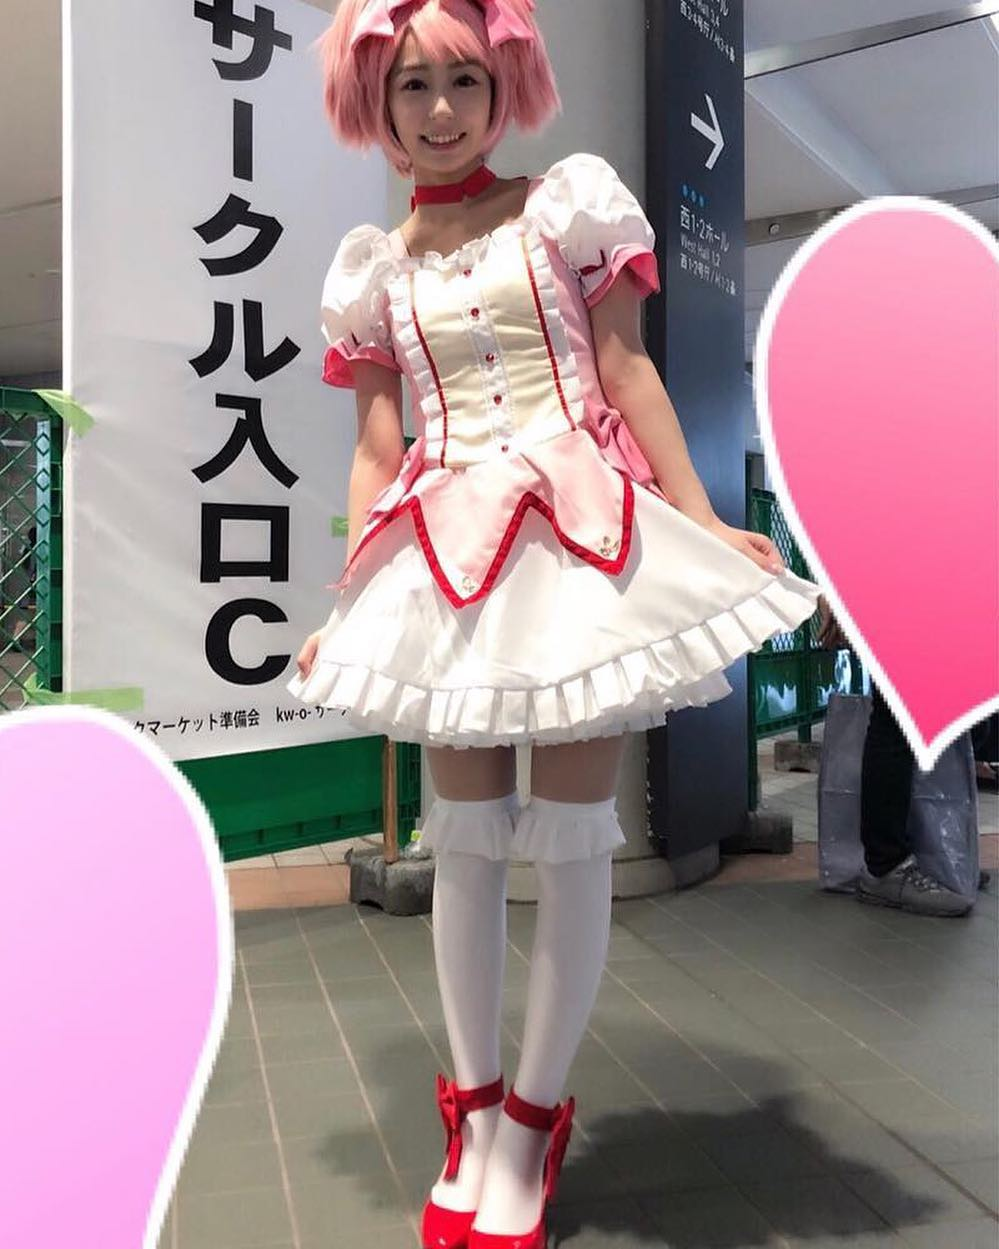 ugaki_misato025.jpg